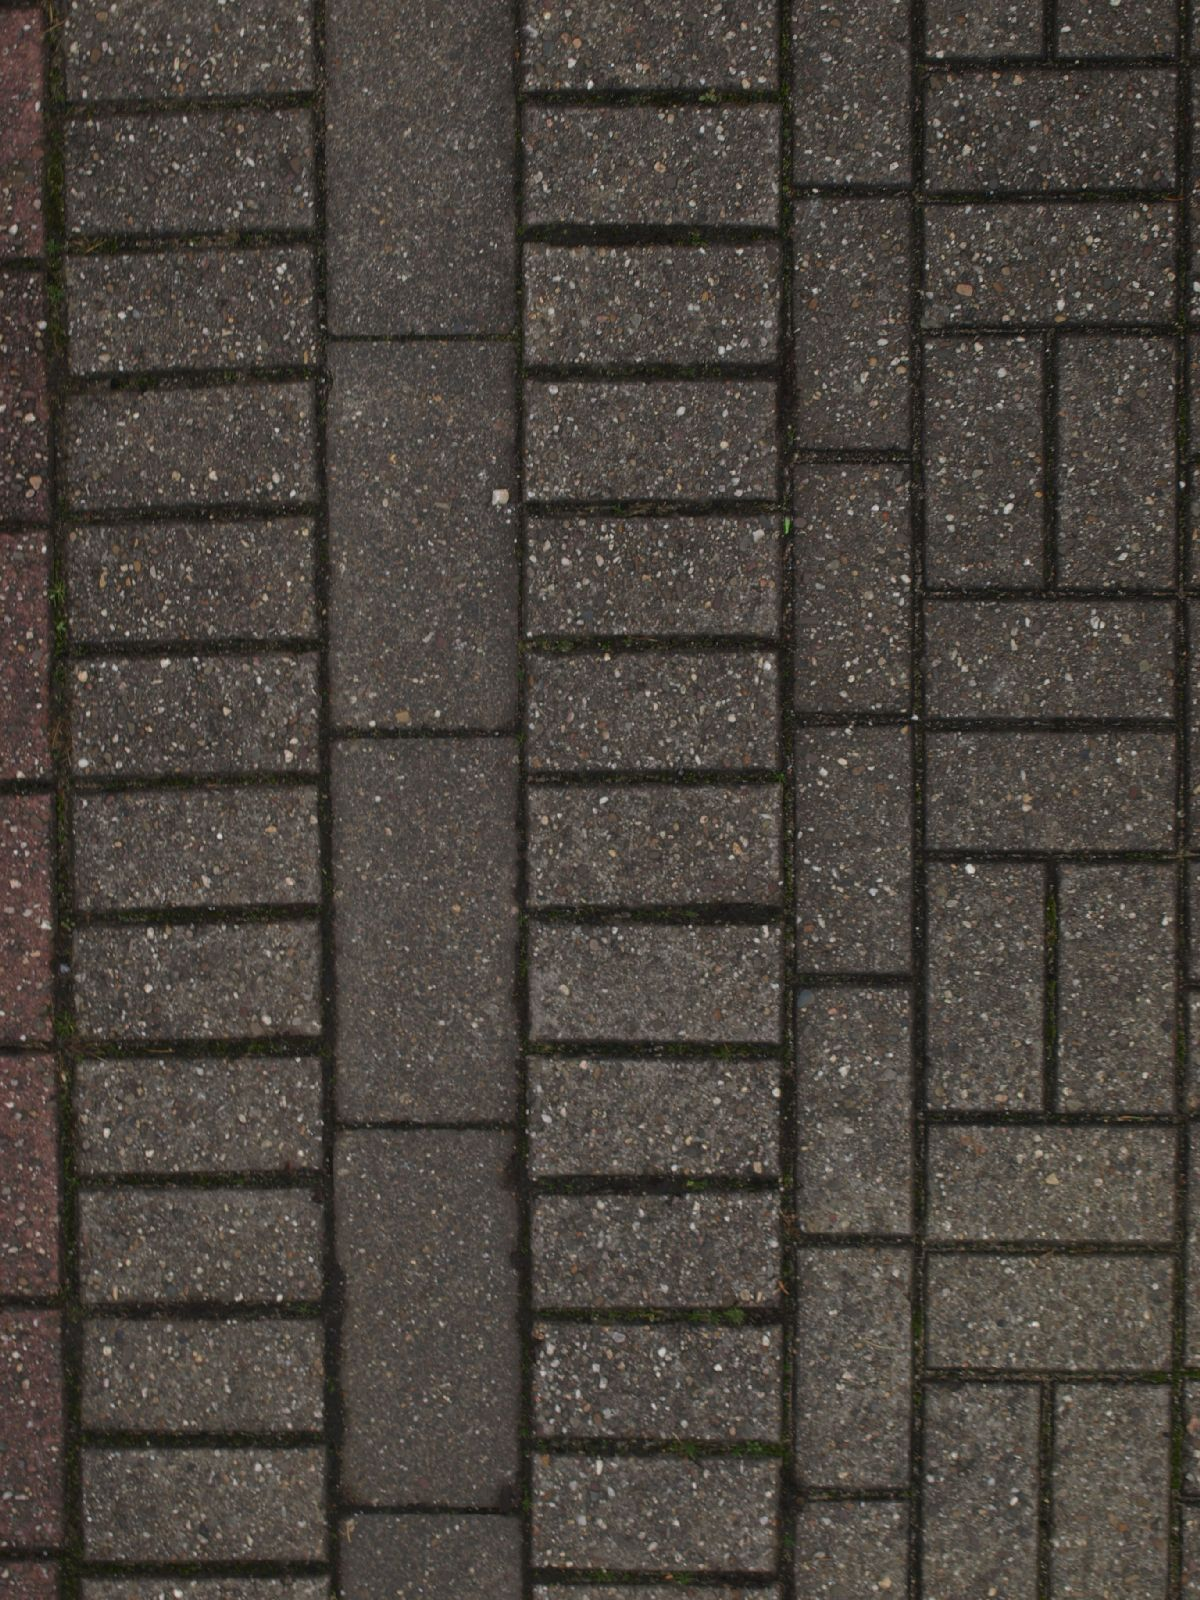 Ground-Urban_Texture_A_PC011299